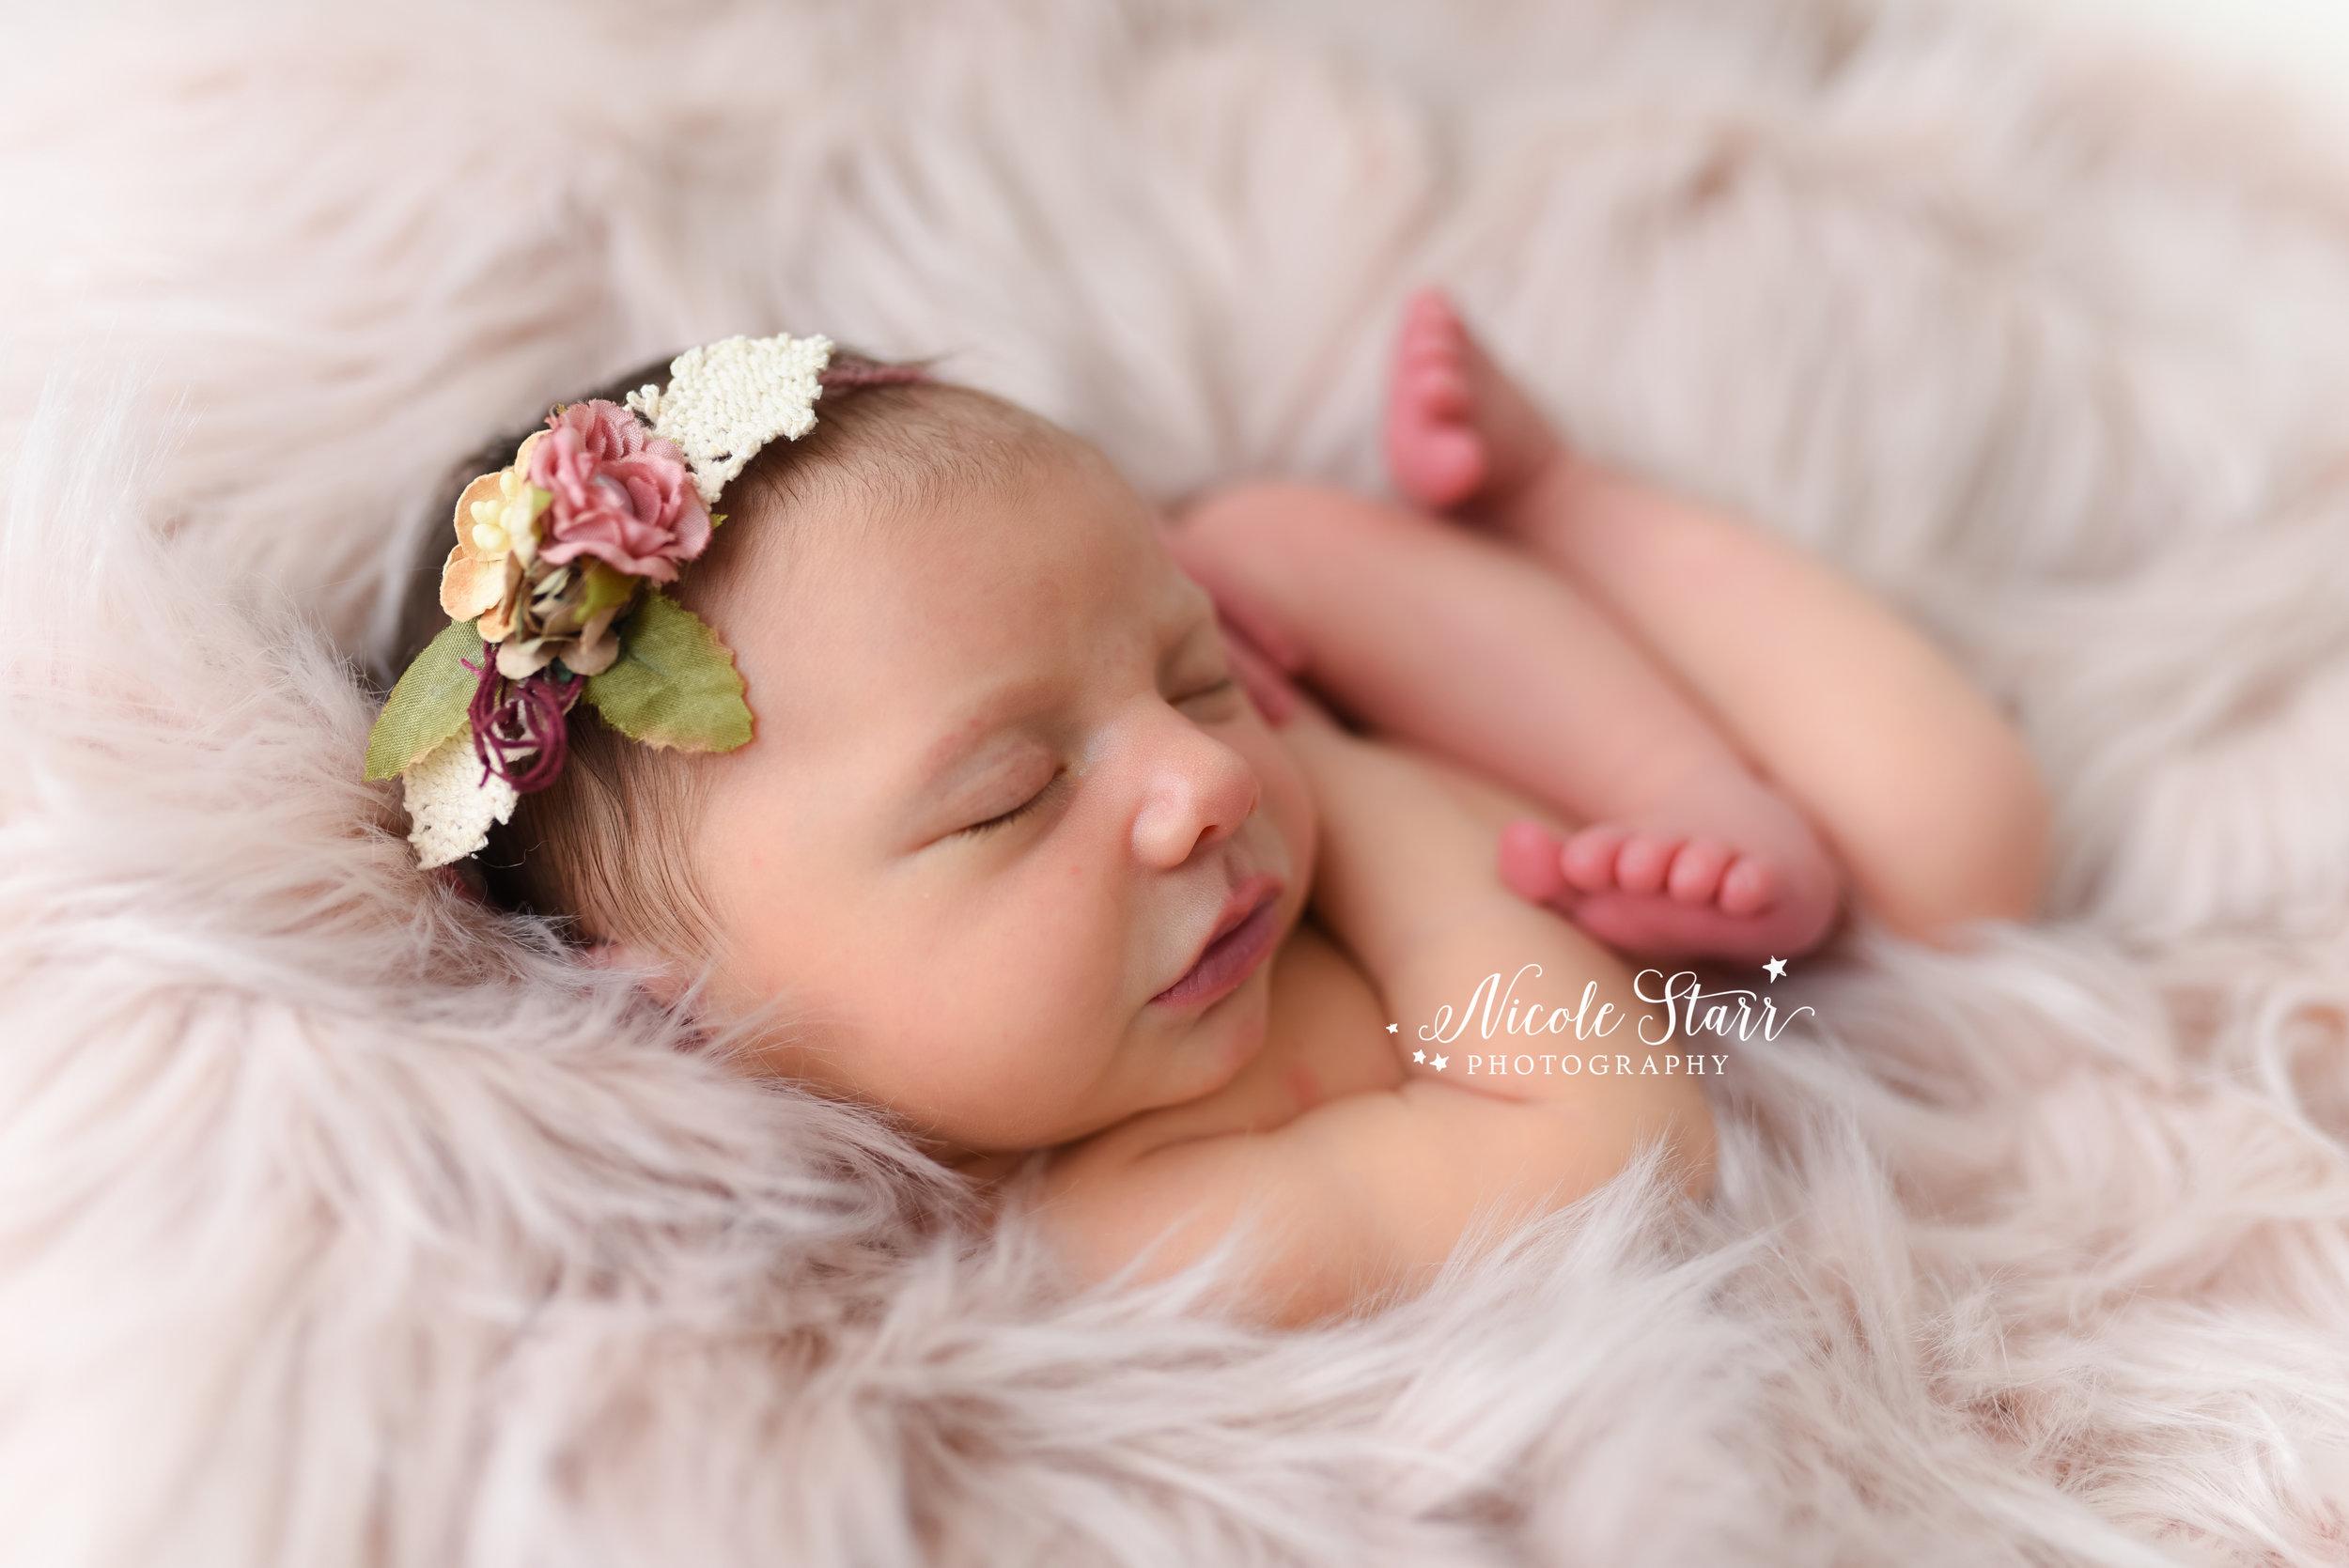 Nicole Starr Photography   Saratoga Springs Newborn Photographer   Boston Newborn Photographer   Upstate NY Newborn Photographer   Newborn Photographer